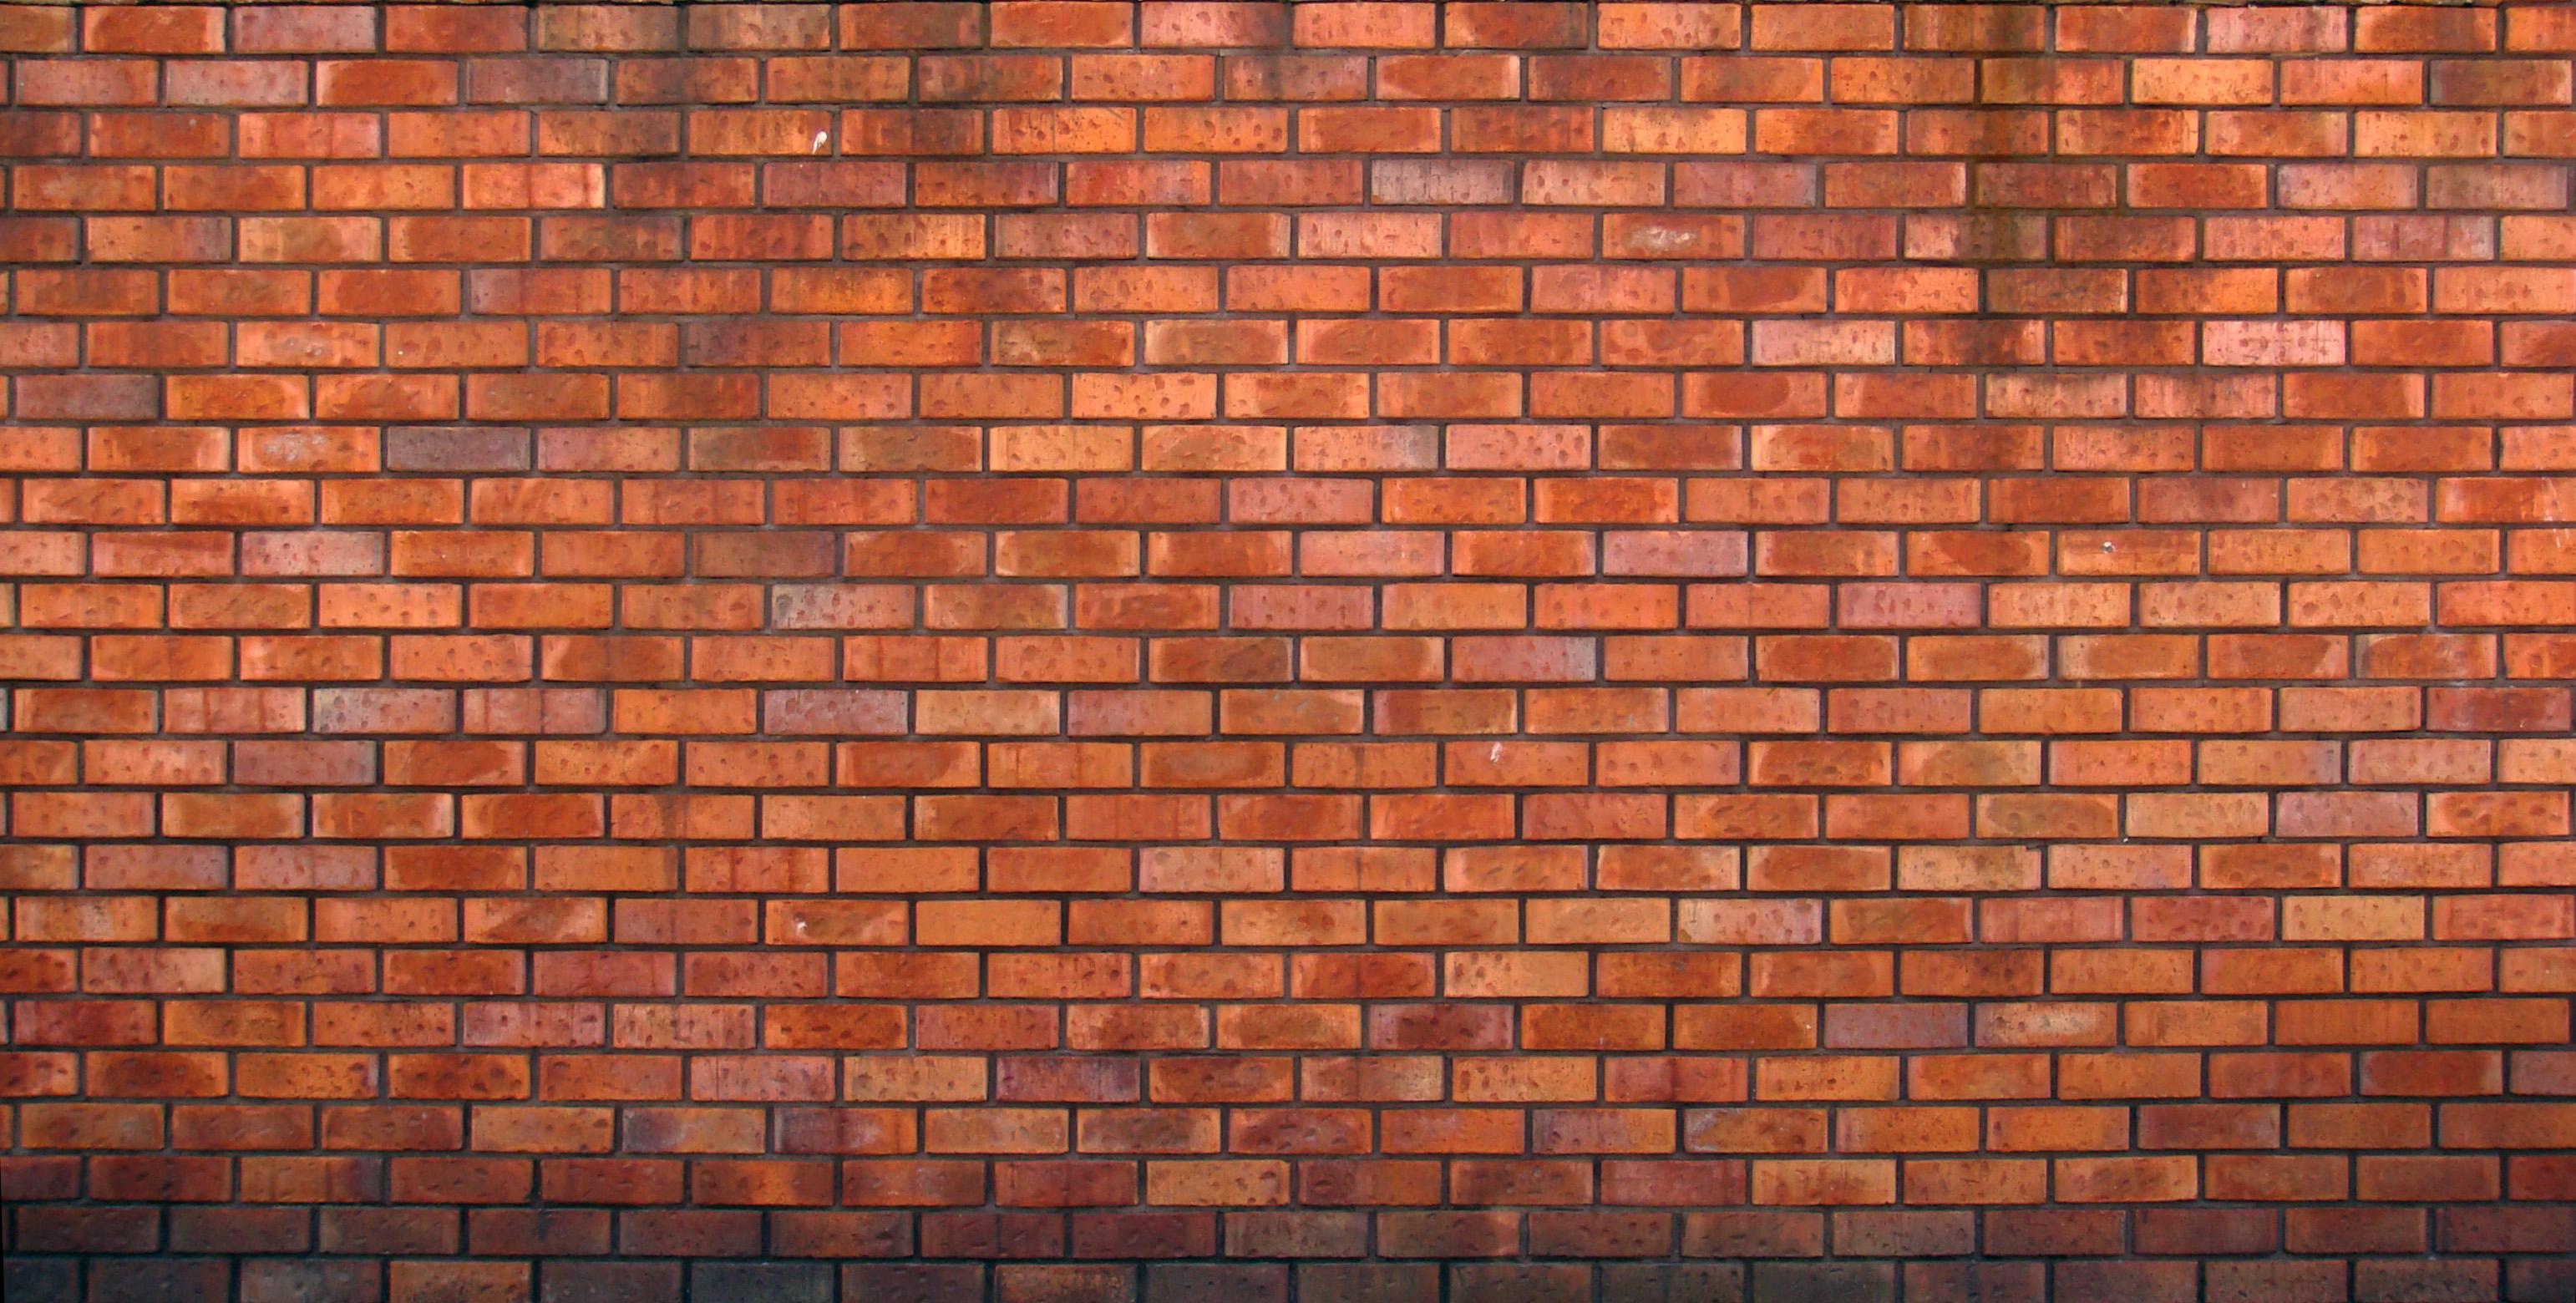 Brick wallpaper clipart svg free stock Brick Wall Hd Wallpaper - Brick Wall Background Clipart (#966019 ... svg free stock